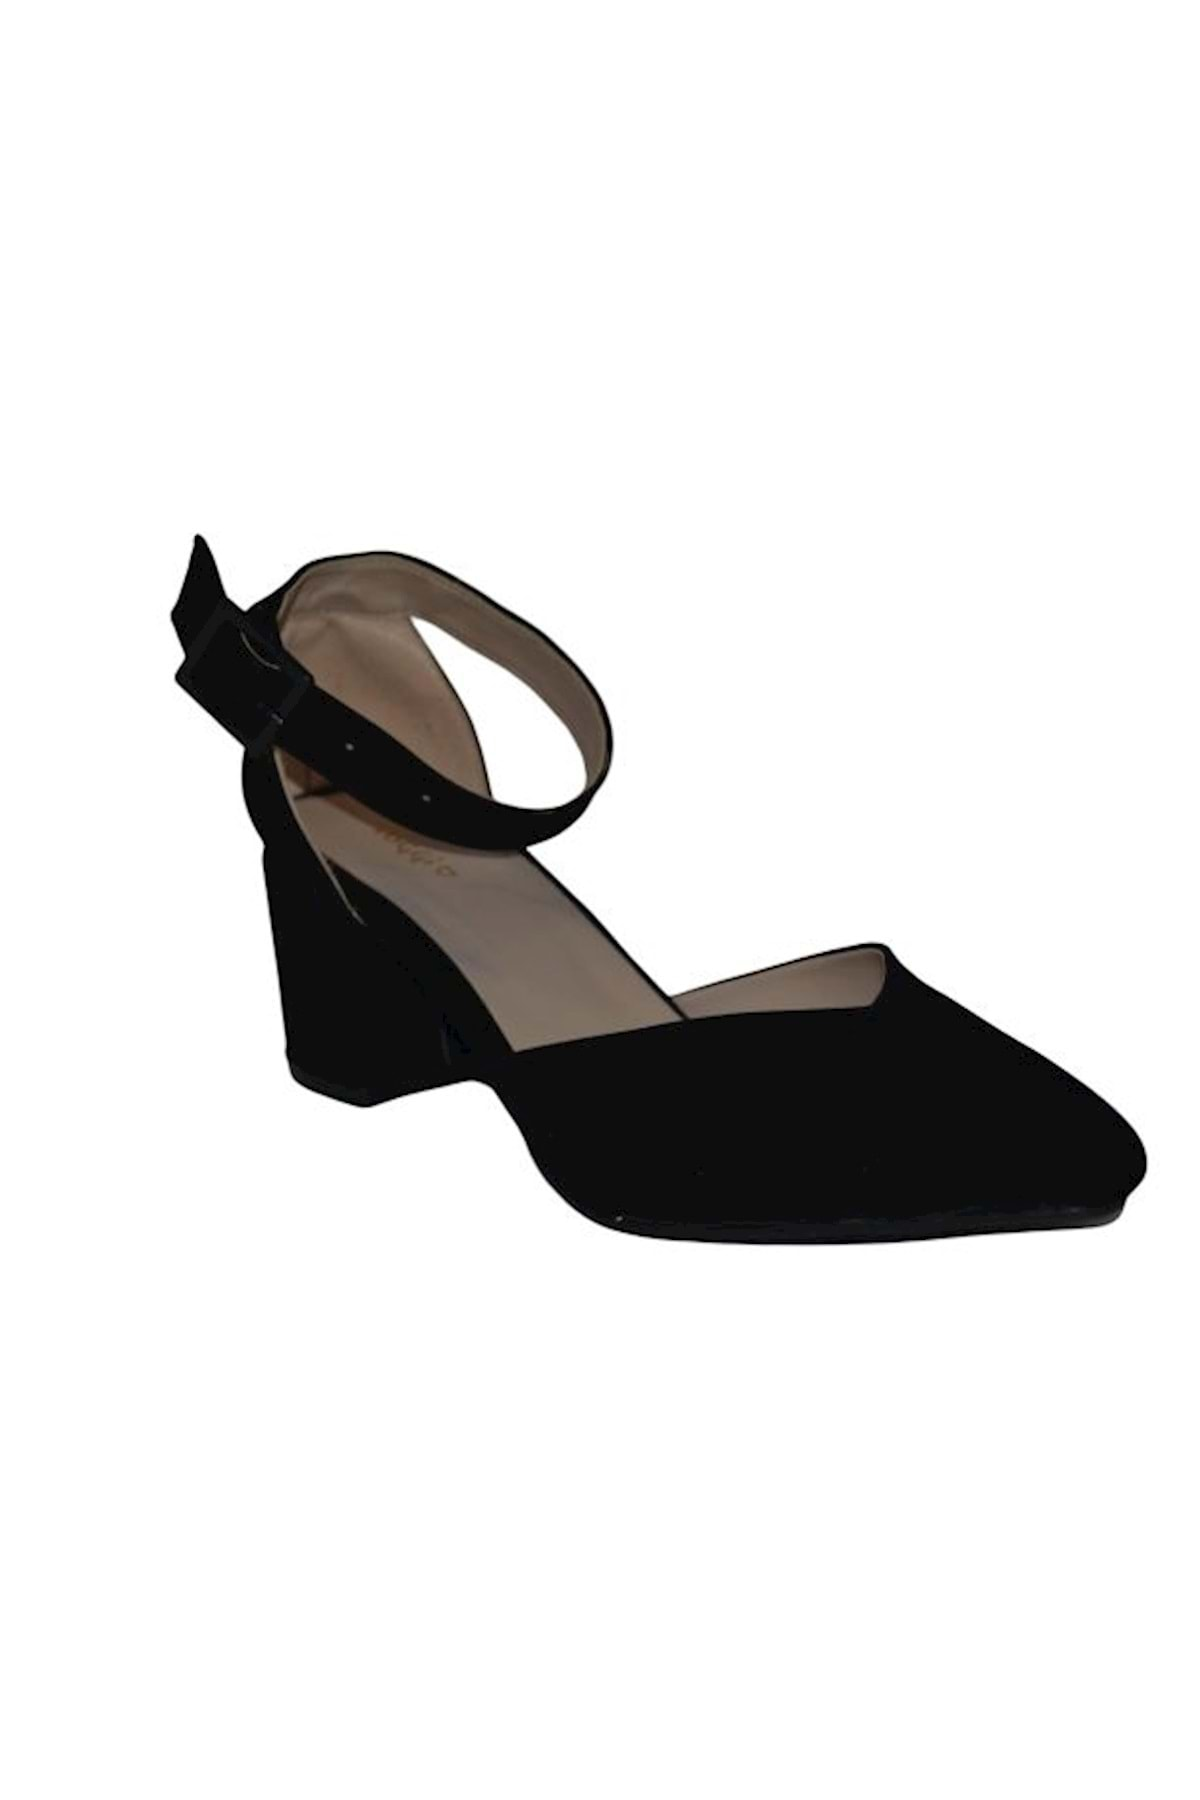 TOGGİ Kadın Siyah Topuklu Ayakkabı